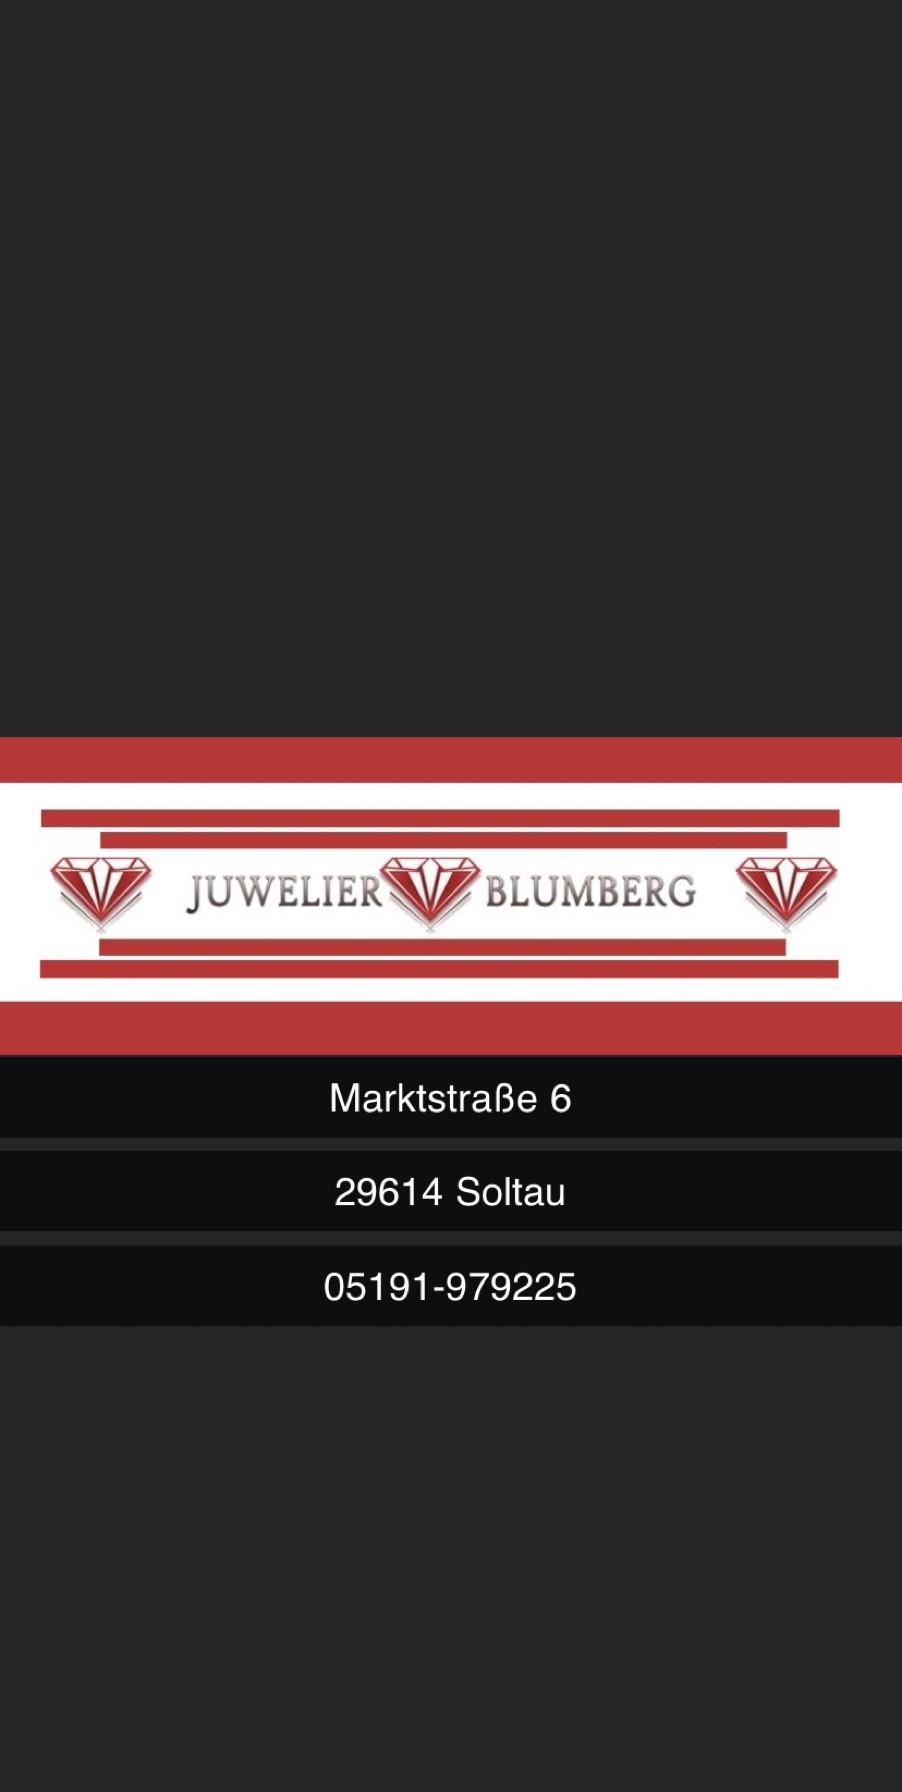 juwelier-blumberg